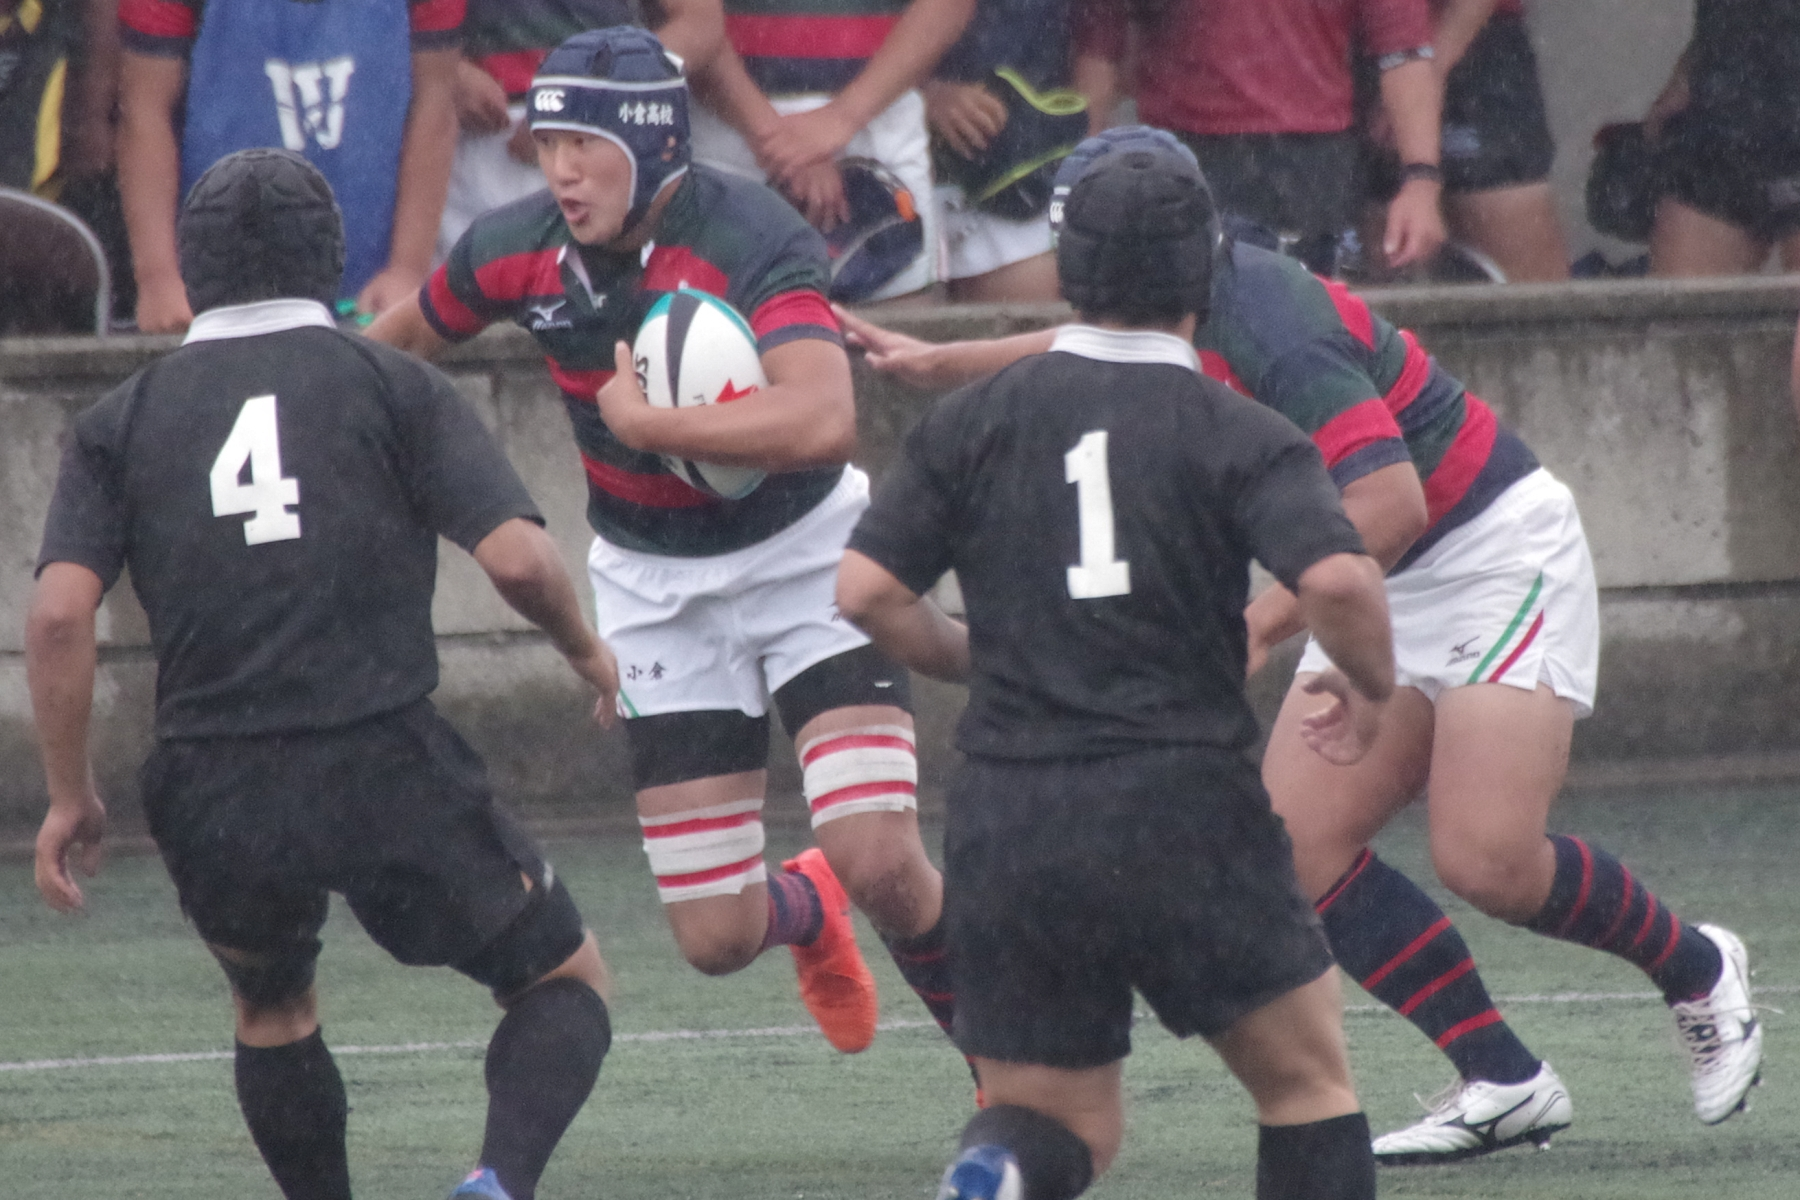 http://kokura-rugby.sakura.ne.jp/180513_134736_0119.jpg